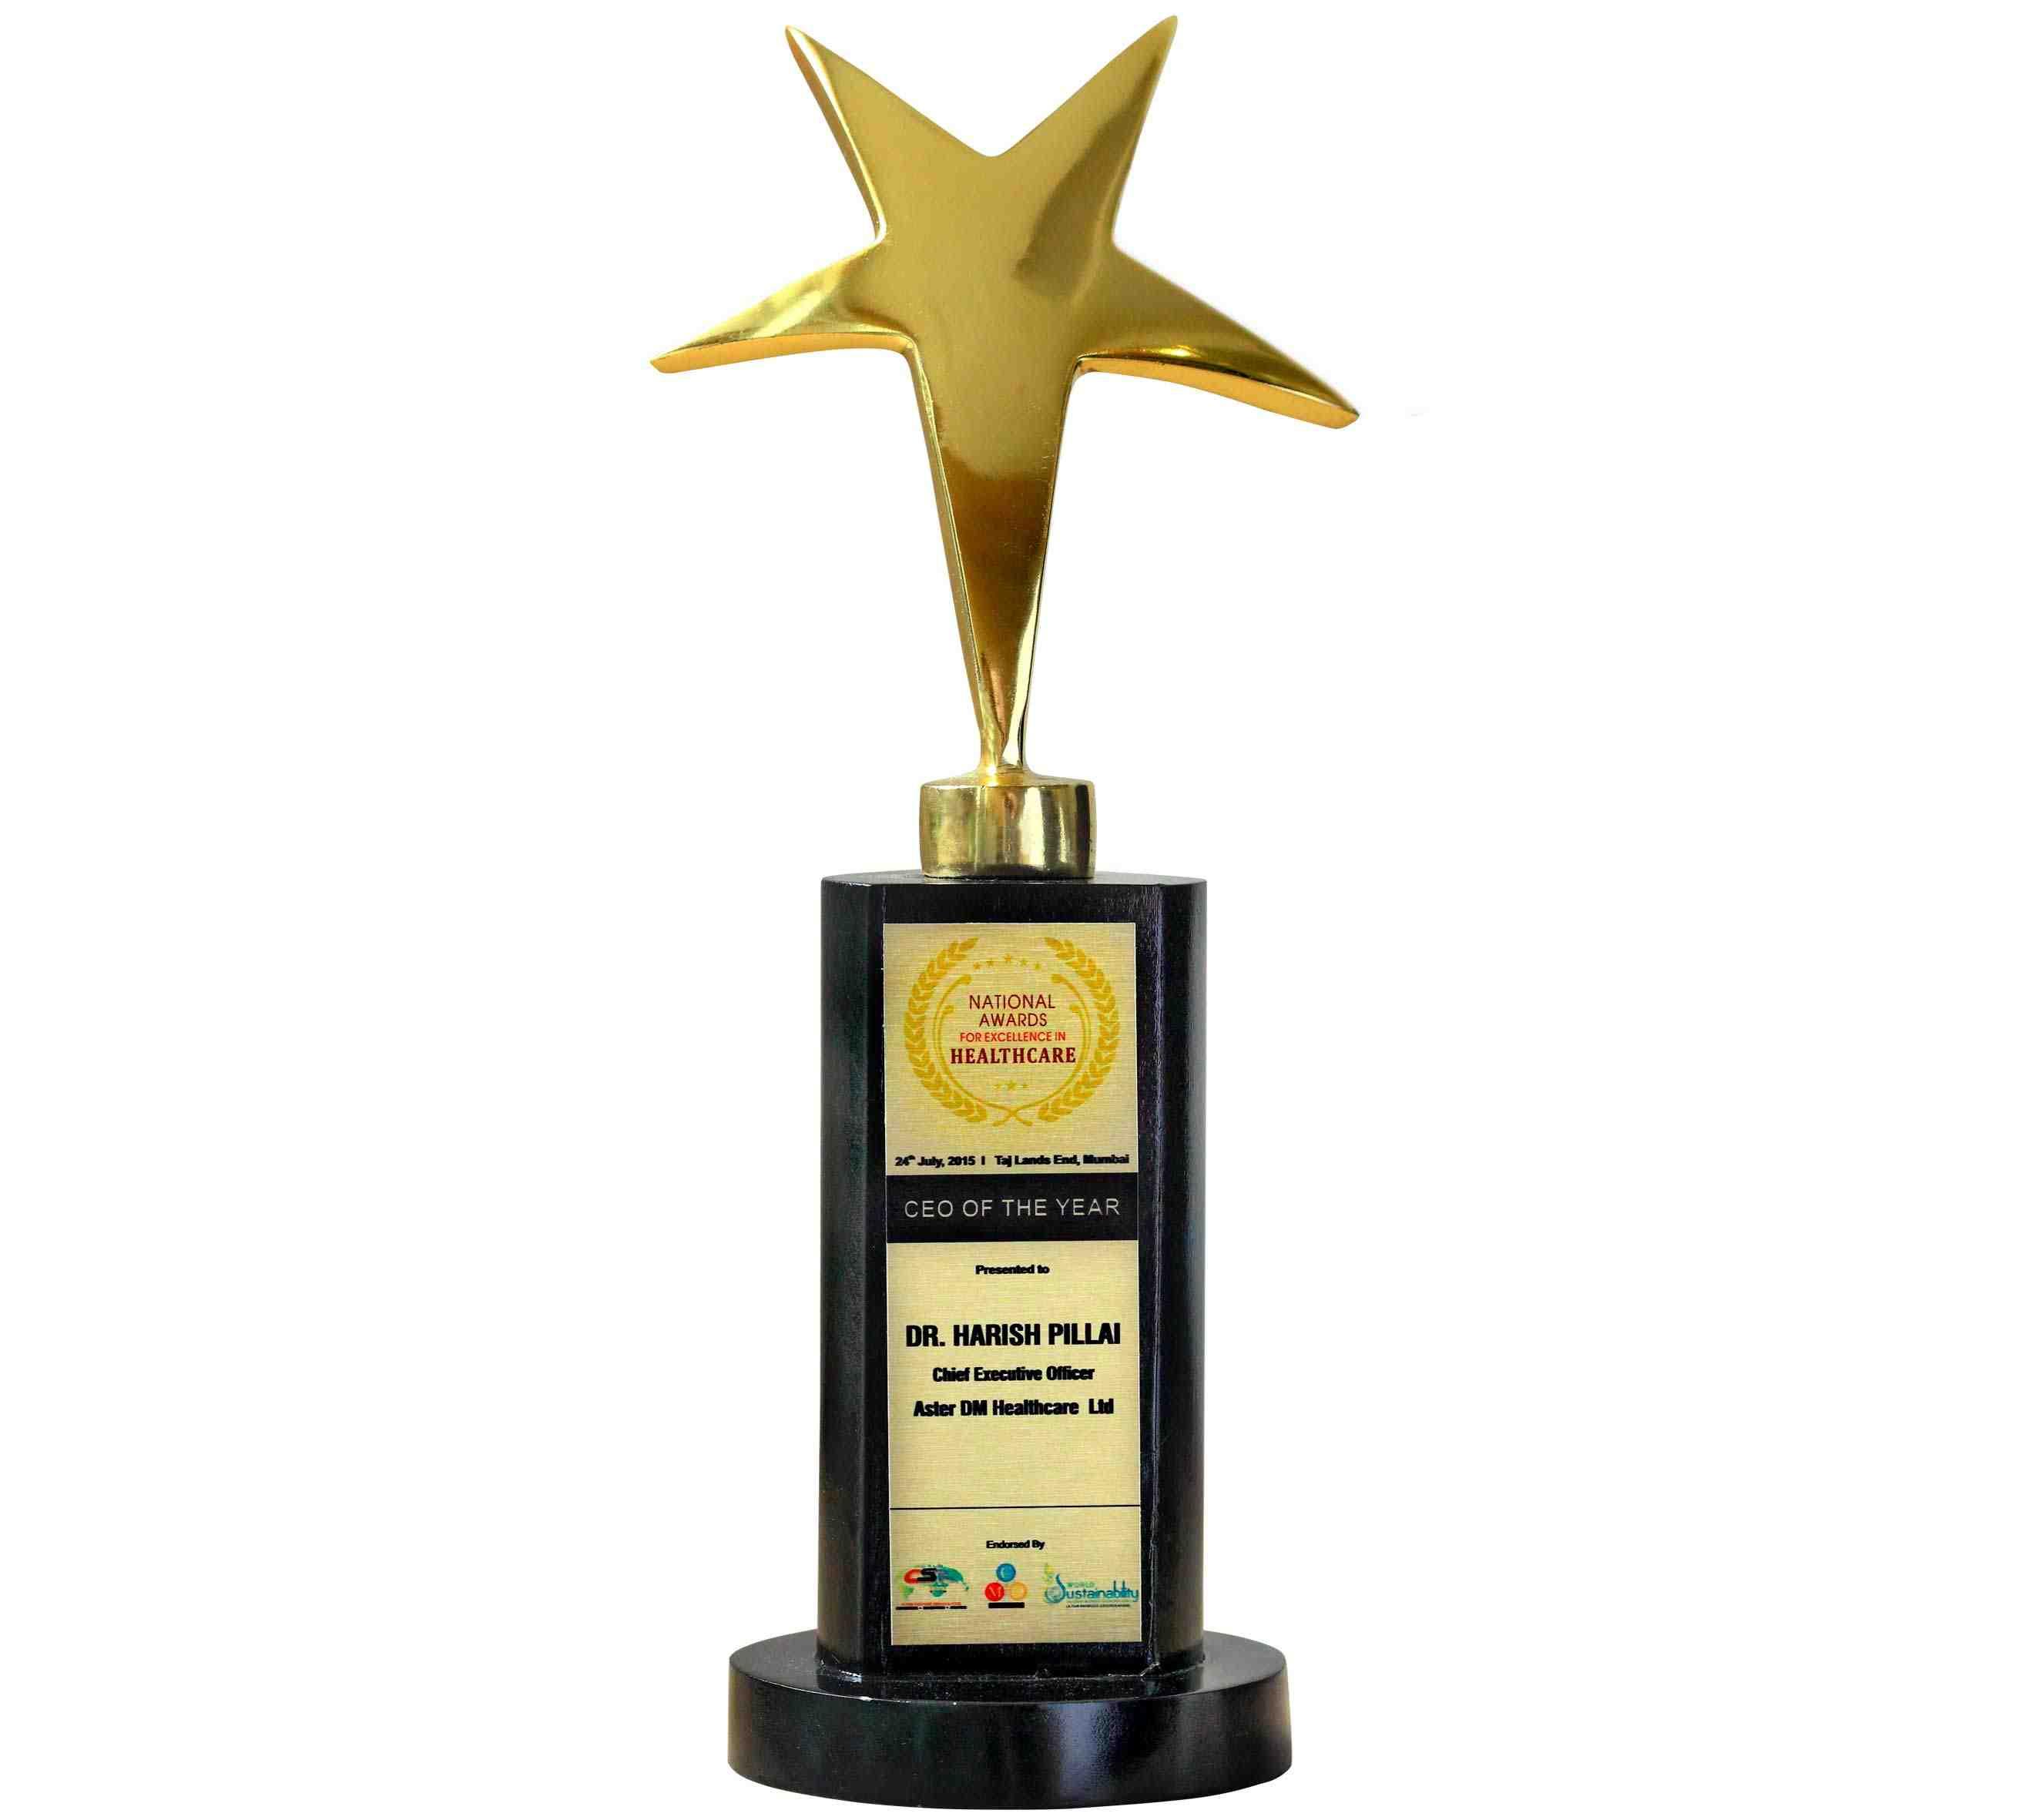 Awardnew11